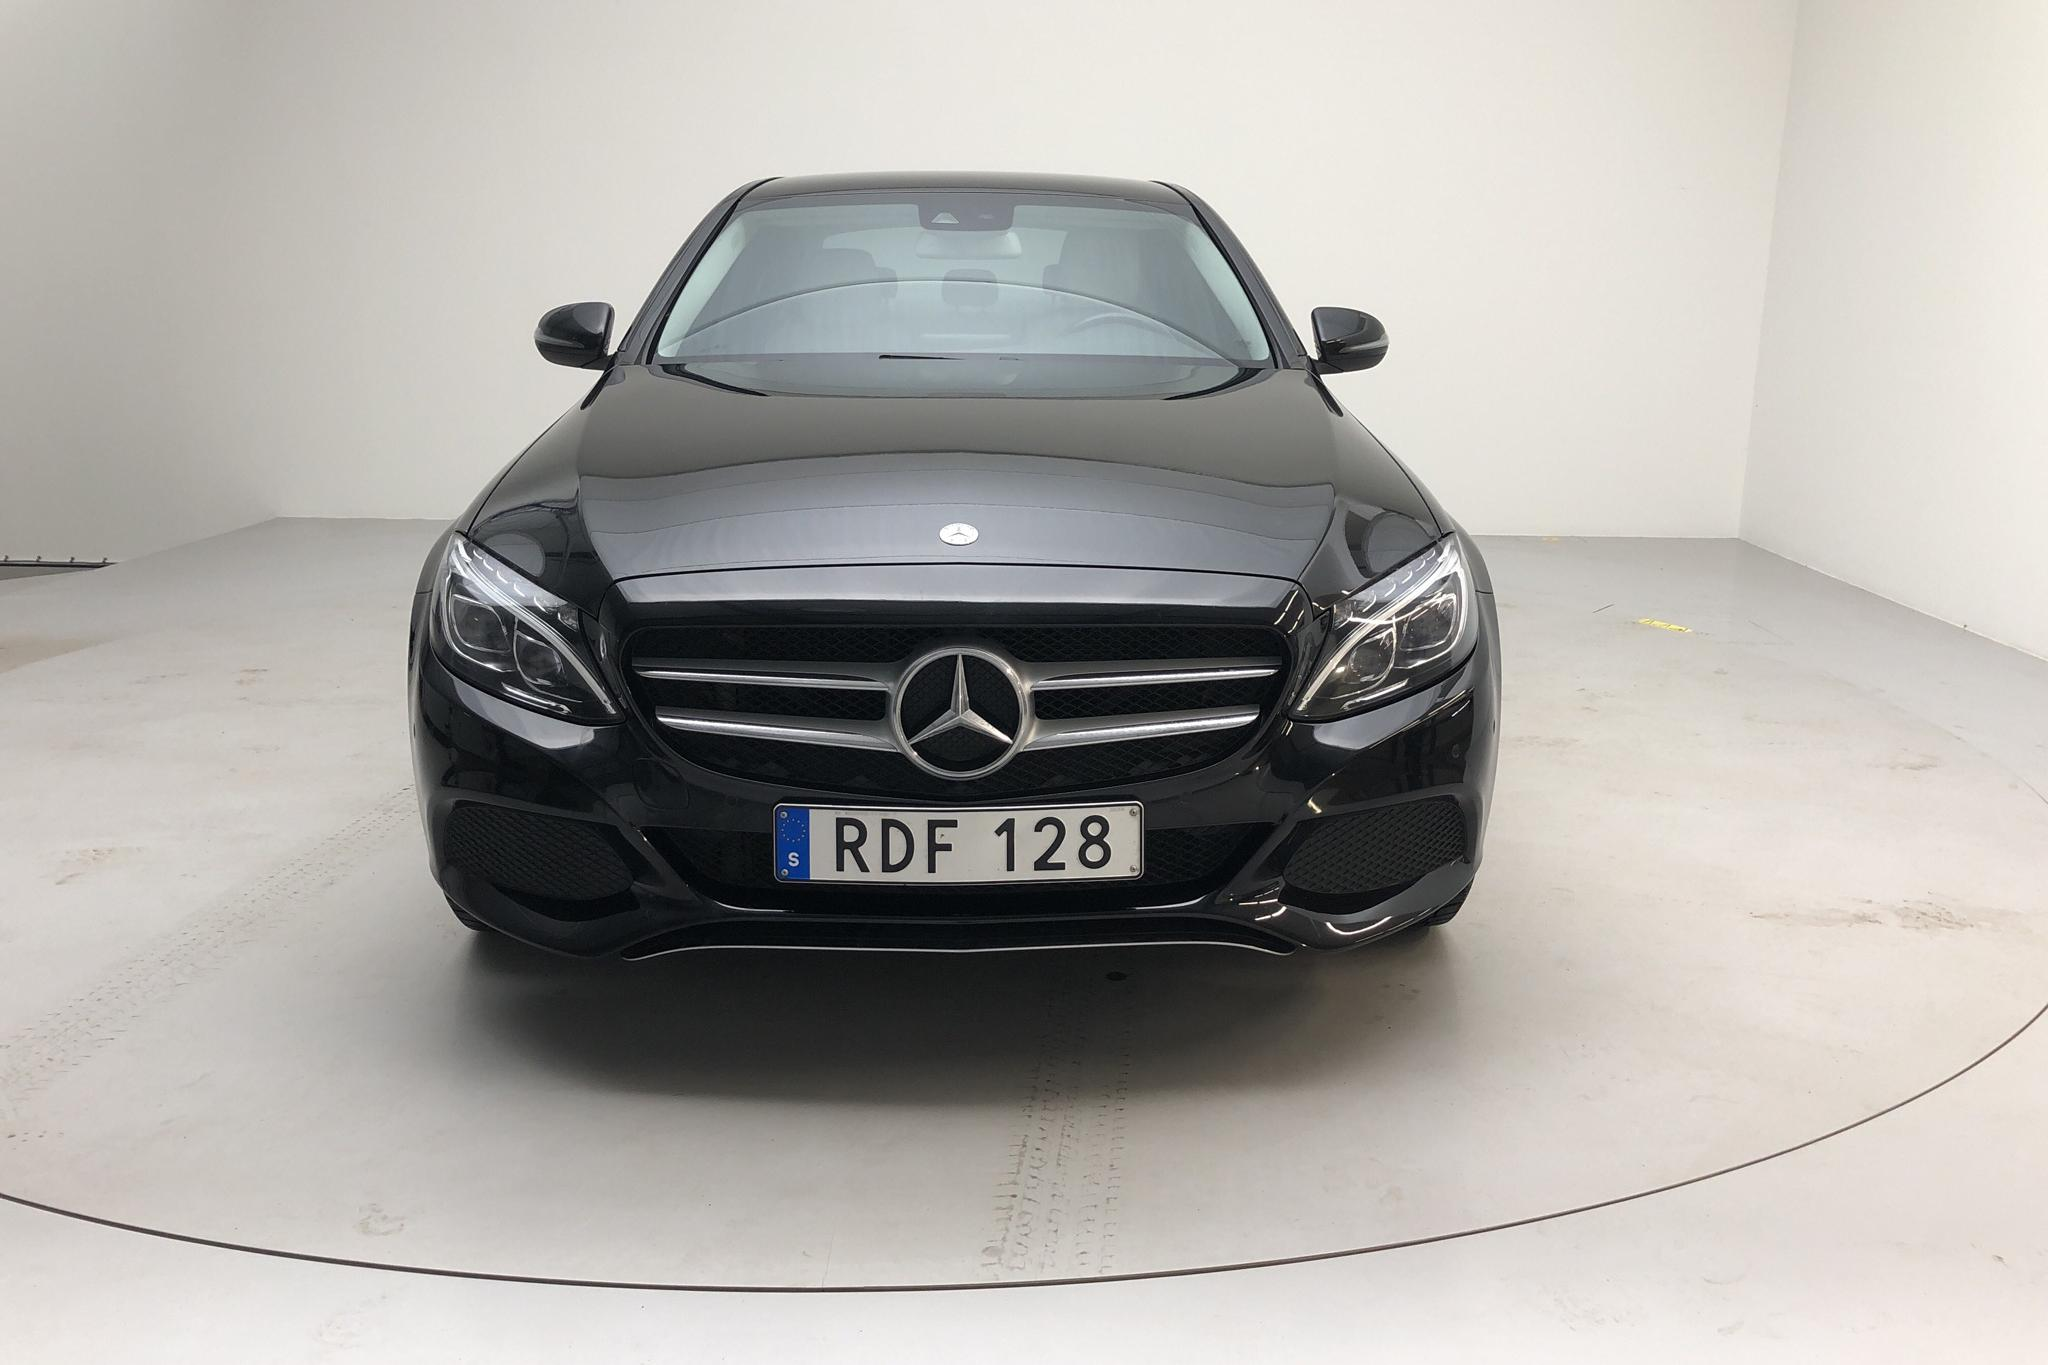 Mercedes C 220 d 4MATIC W205 (170hk) - 184 060 km - Automatic - black - 2016